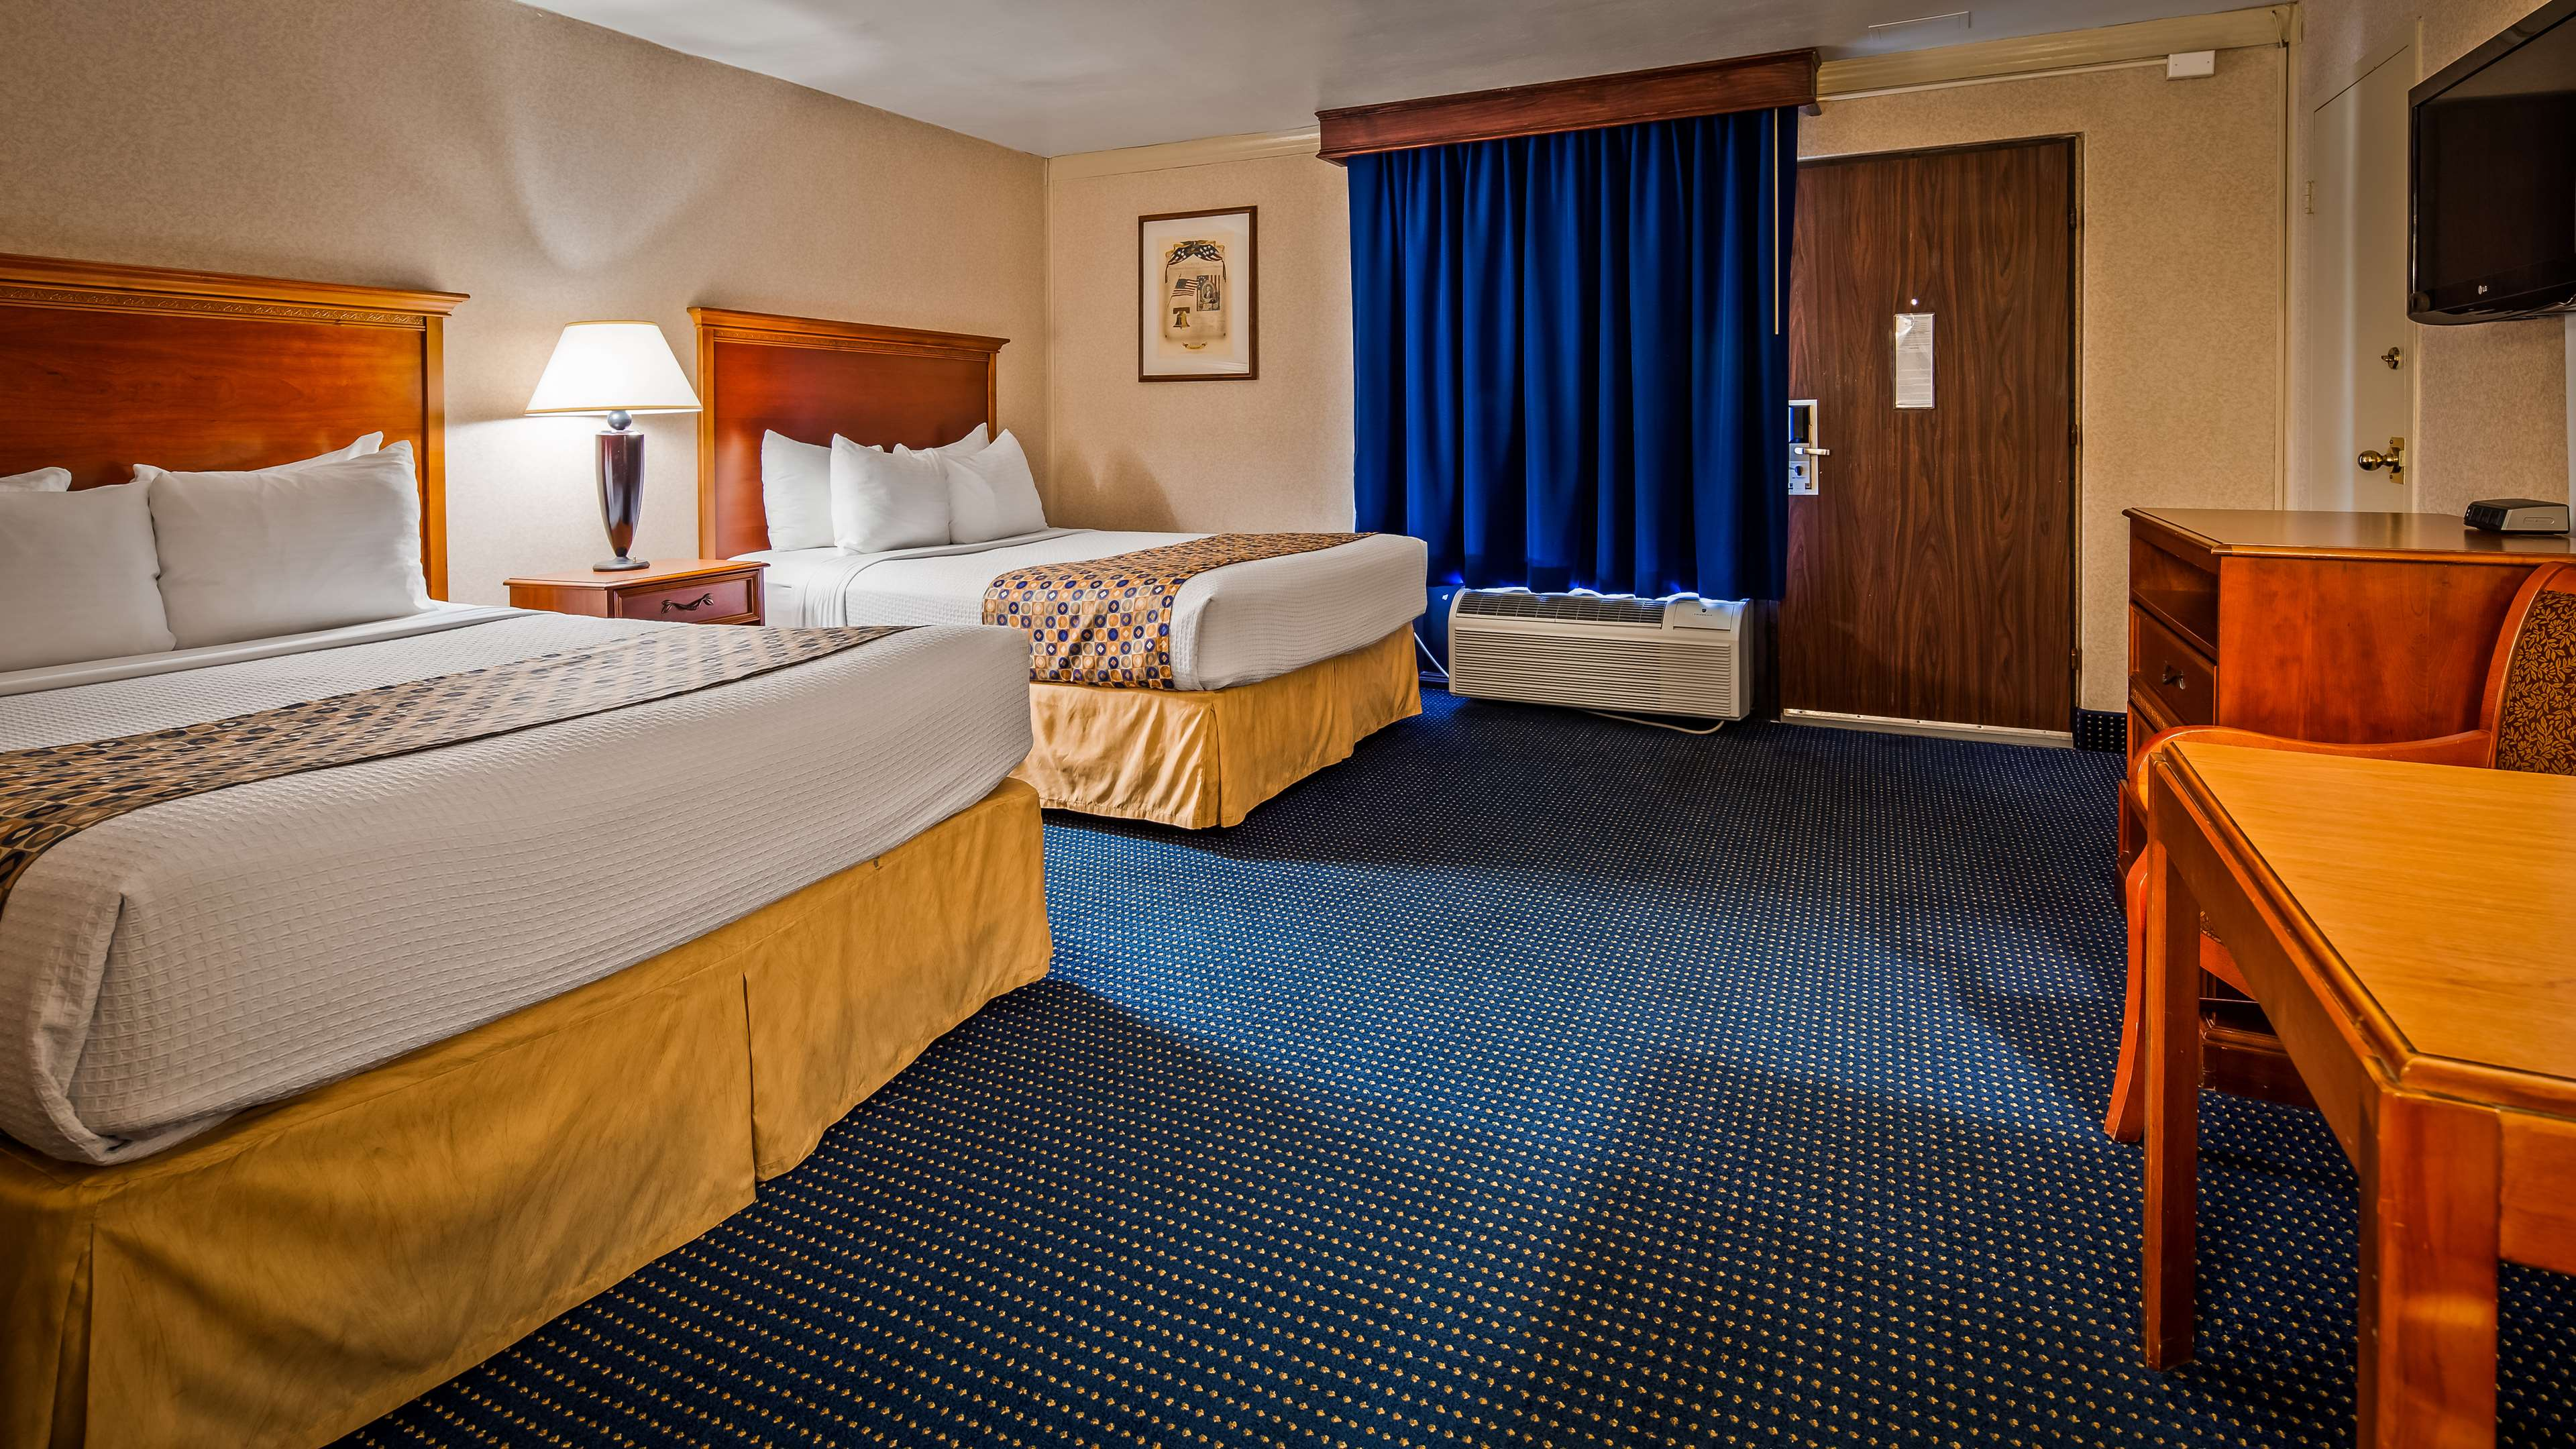 Best Western Pentagon Hotel - Reagan Airport image 15